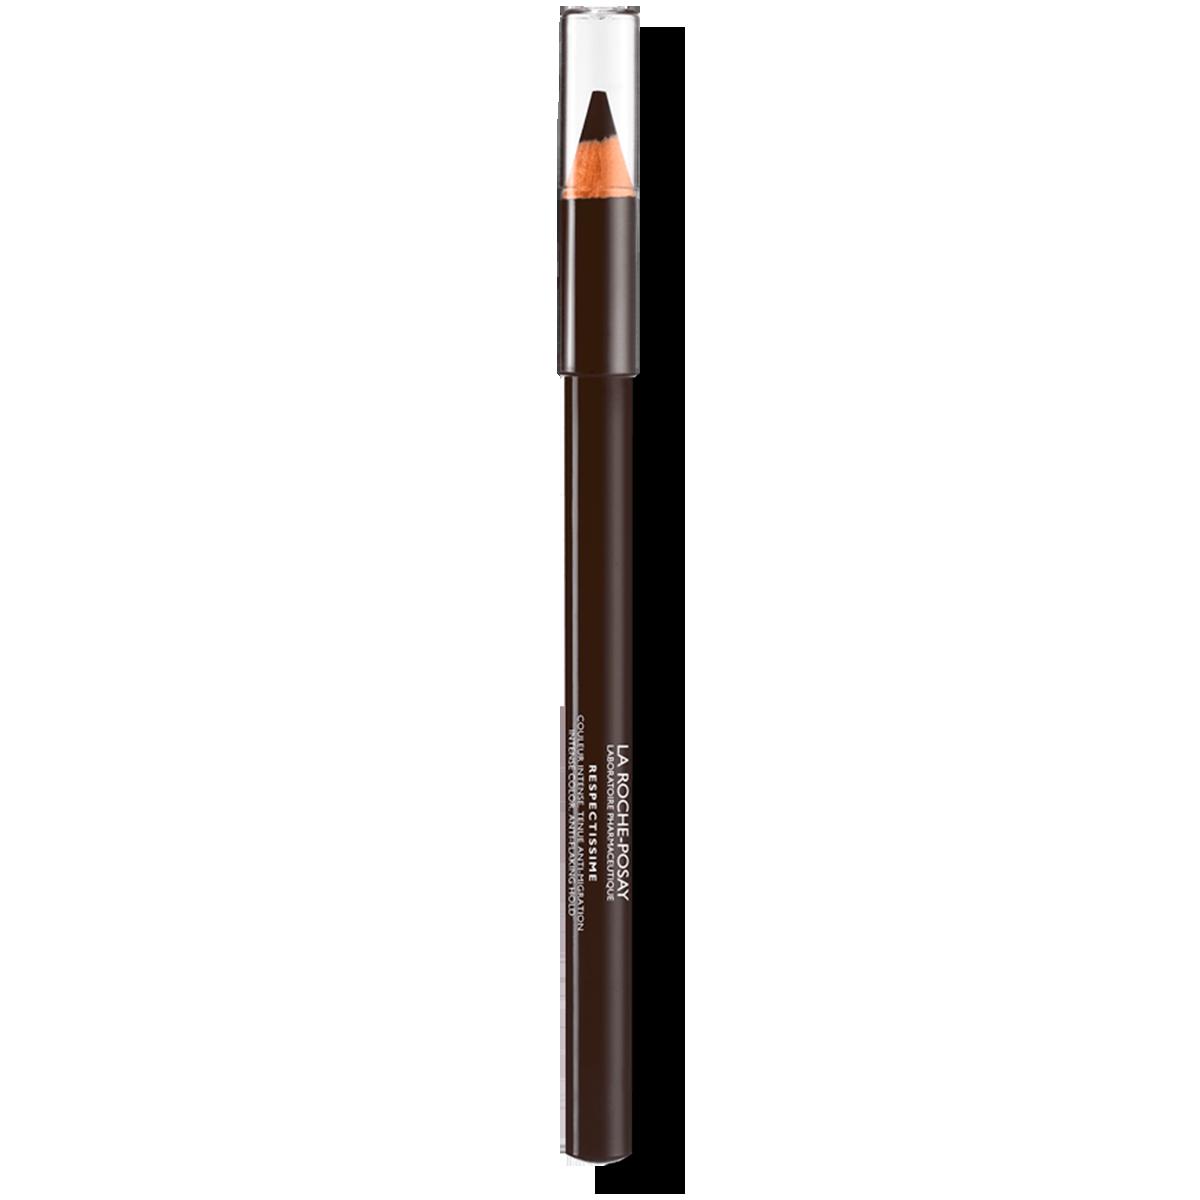 La Roche Posay Herkkä Toleriane Make up EYE PENCIL Brown 3337872410